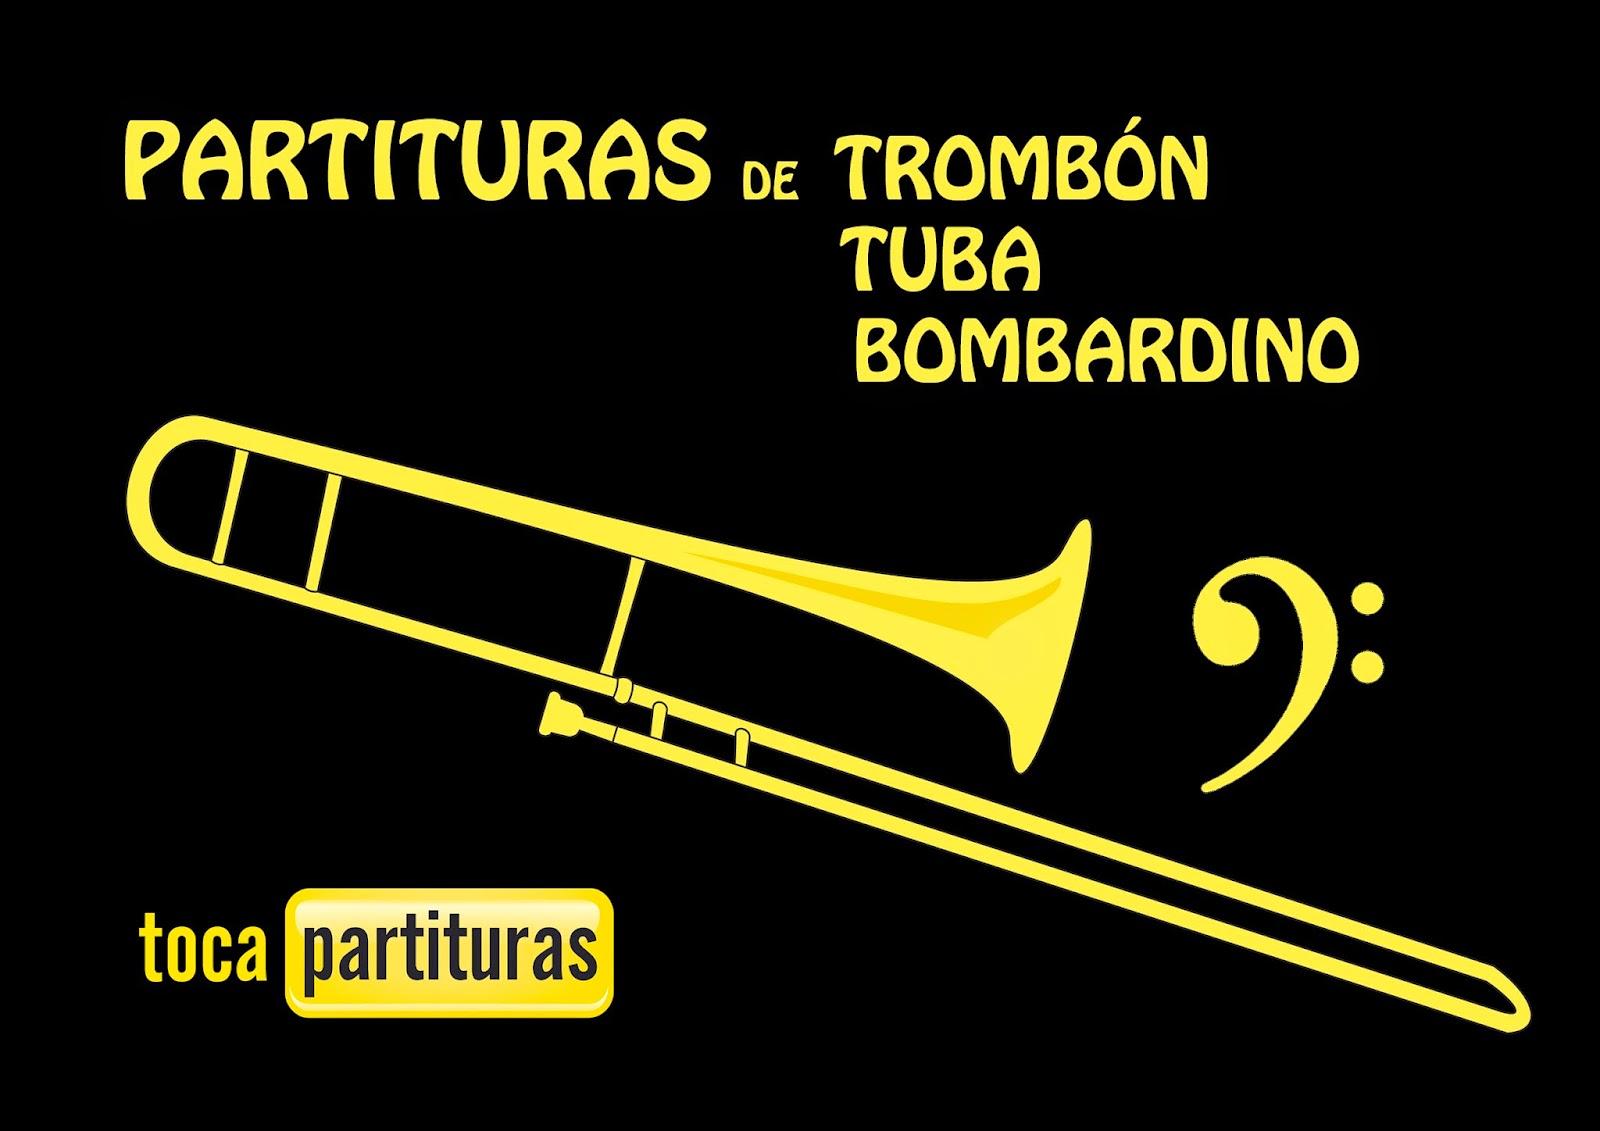 "Partituras de Trombón, Tuba y Bombardino en Clave de Fa ""1000 Partituras Musicales para tocar con tu Trombón Tuba o Bombardino"" tocapartituras.com para"